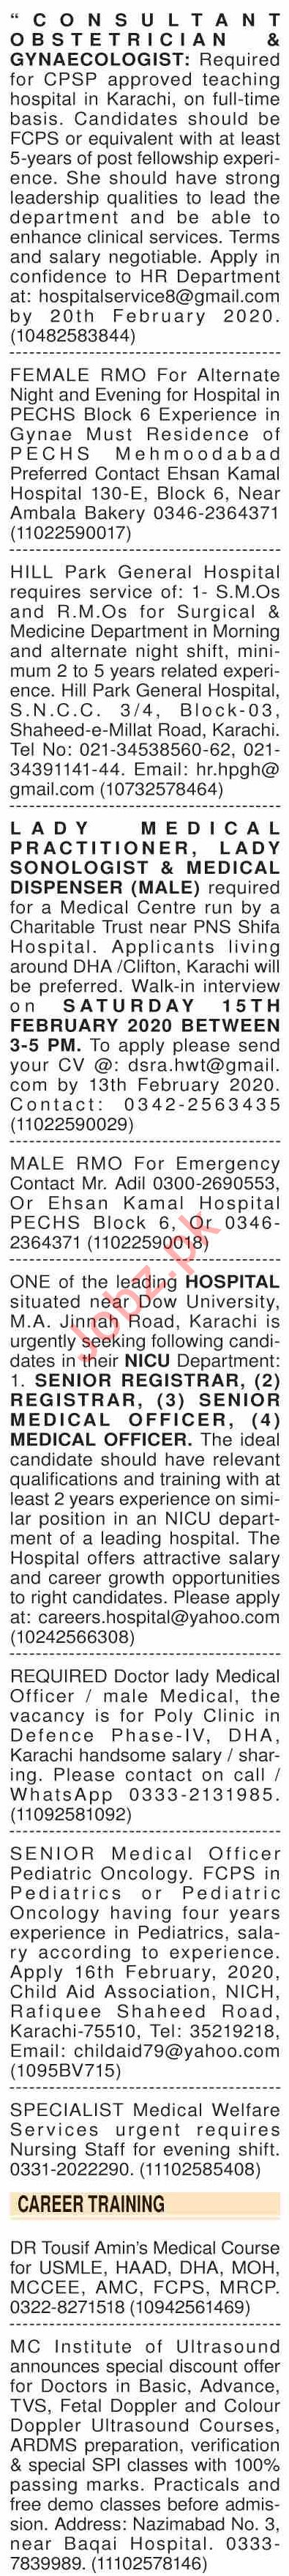 Dawn Sunday Classified Ads 9 Feb 2020 for Medical Staff